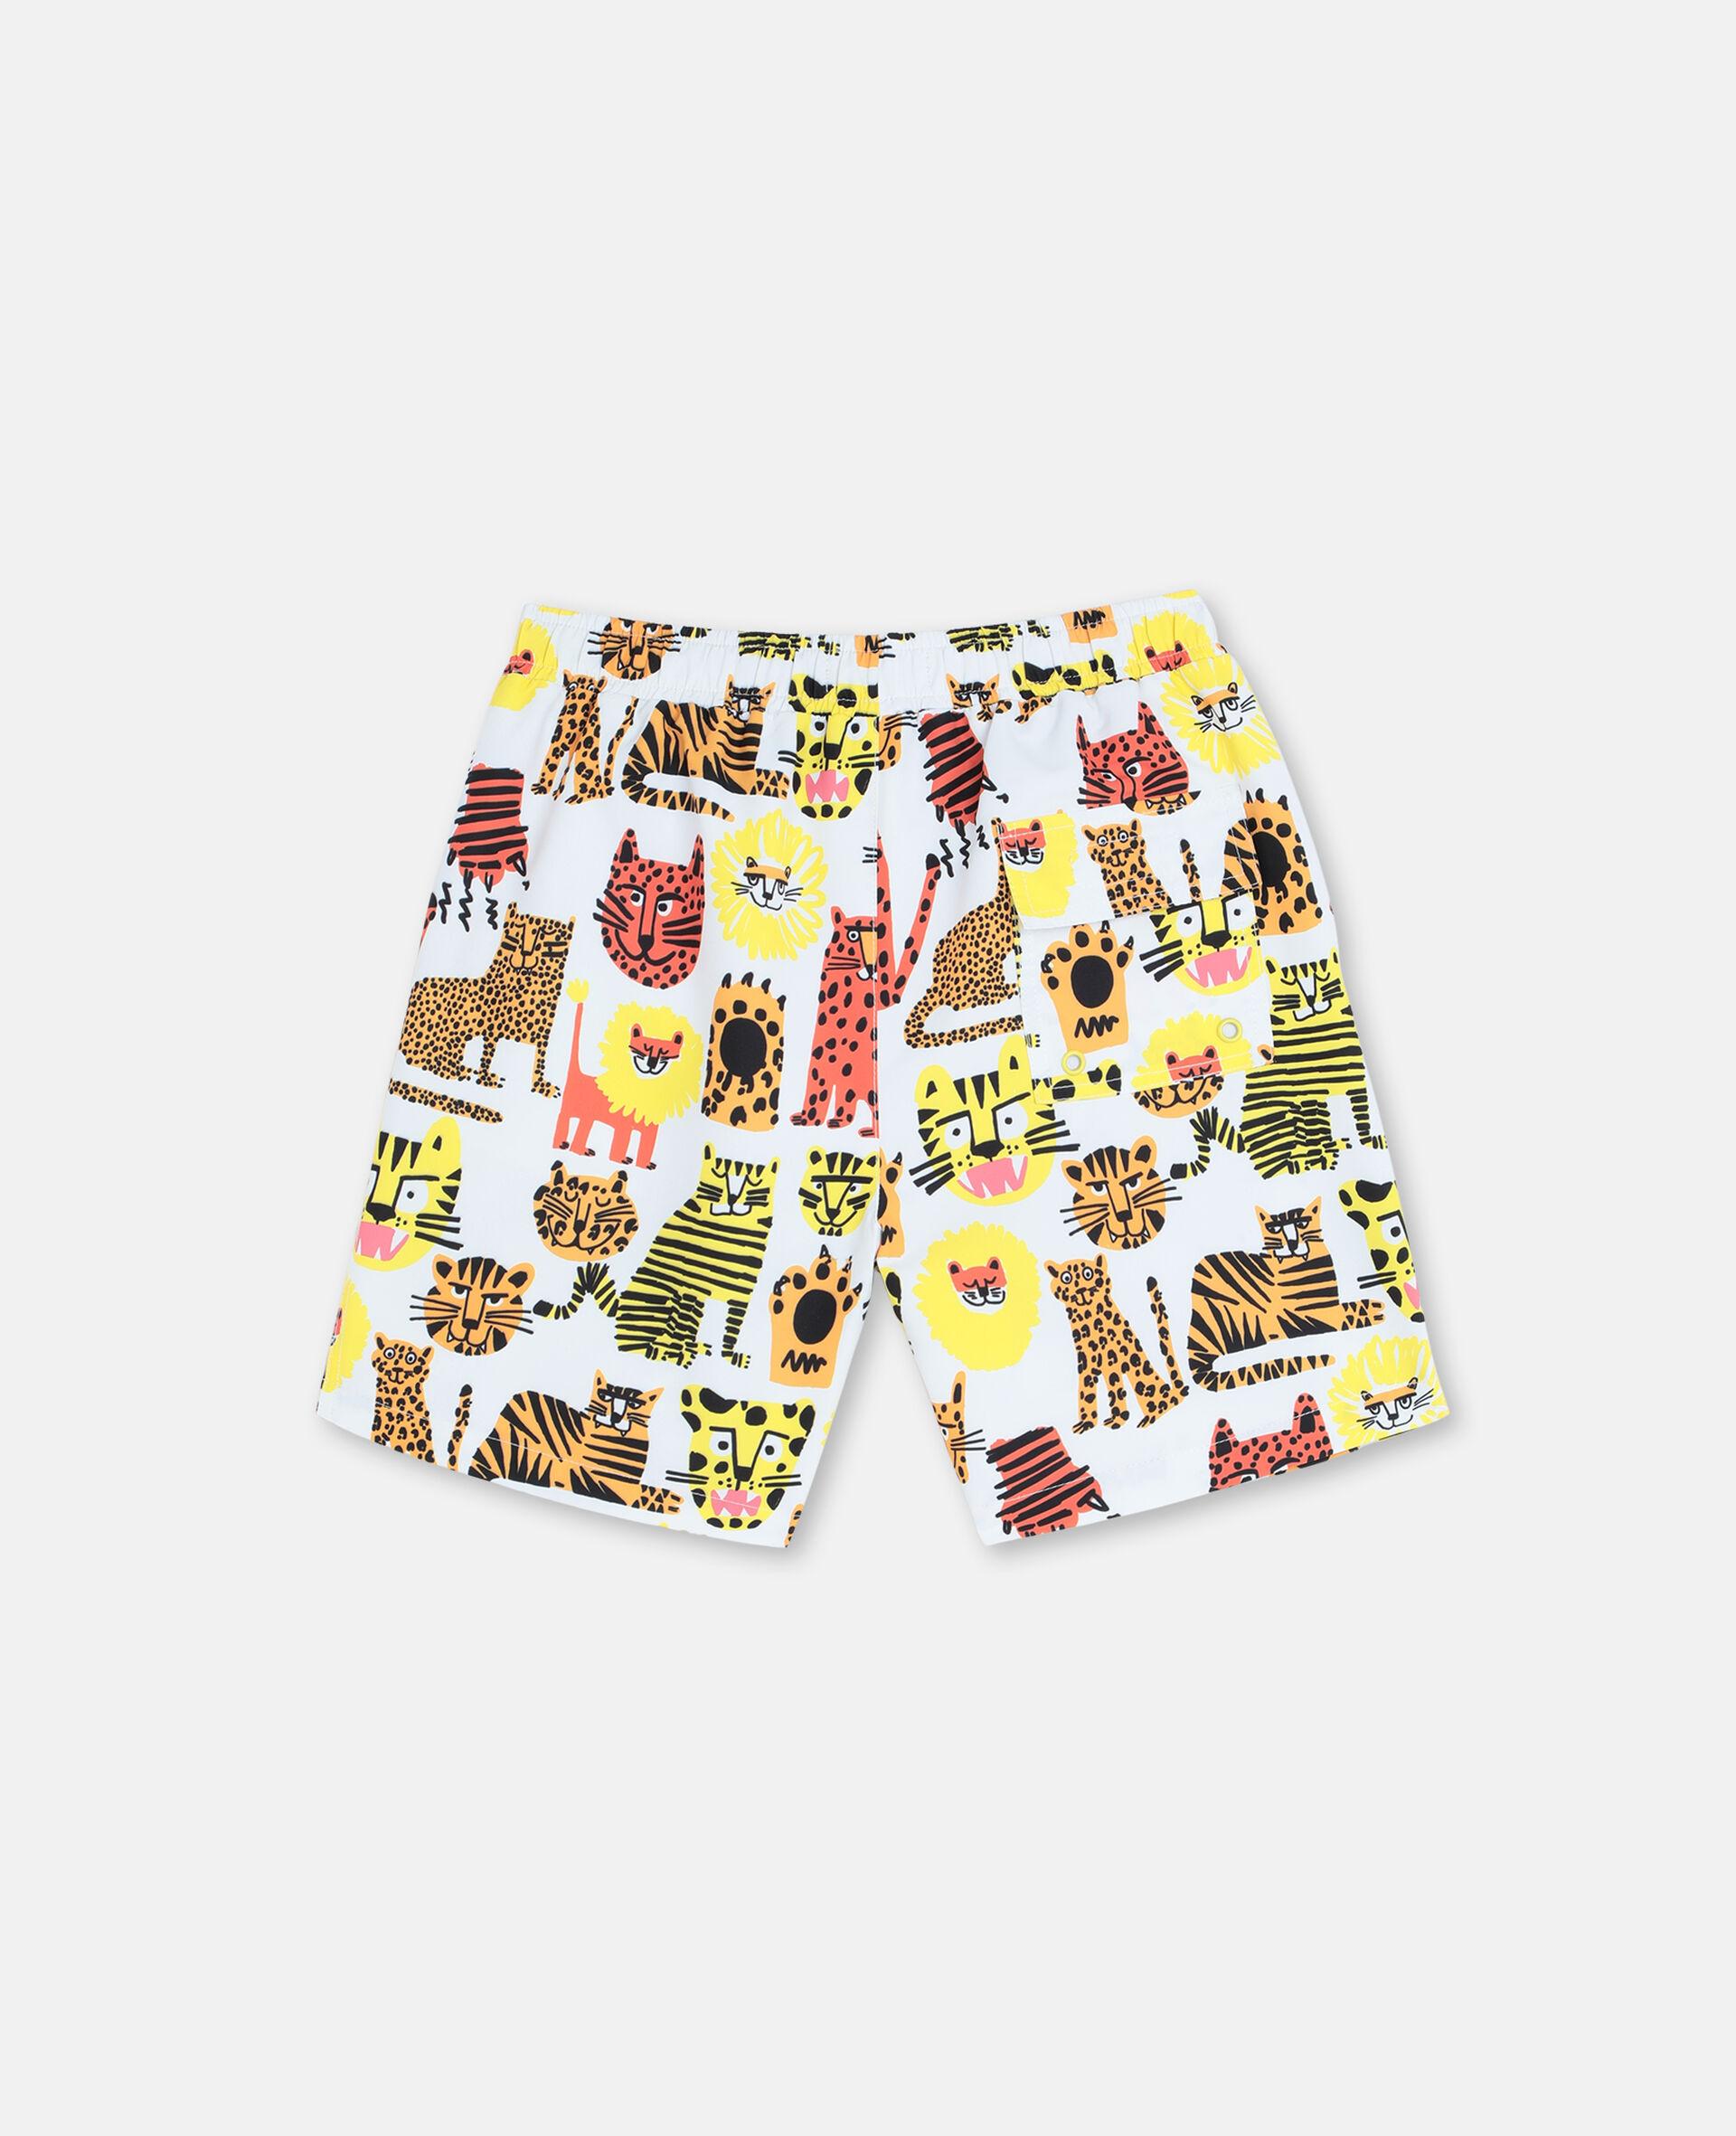 Wild Cats Swim Shorts-Yellow-large image number 4